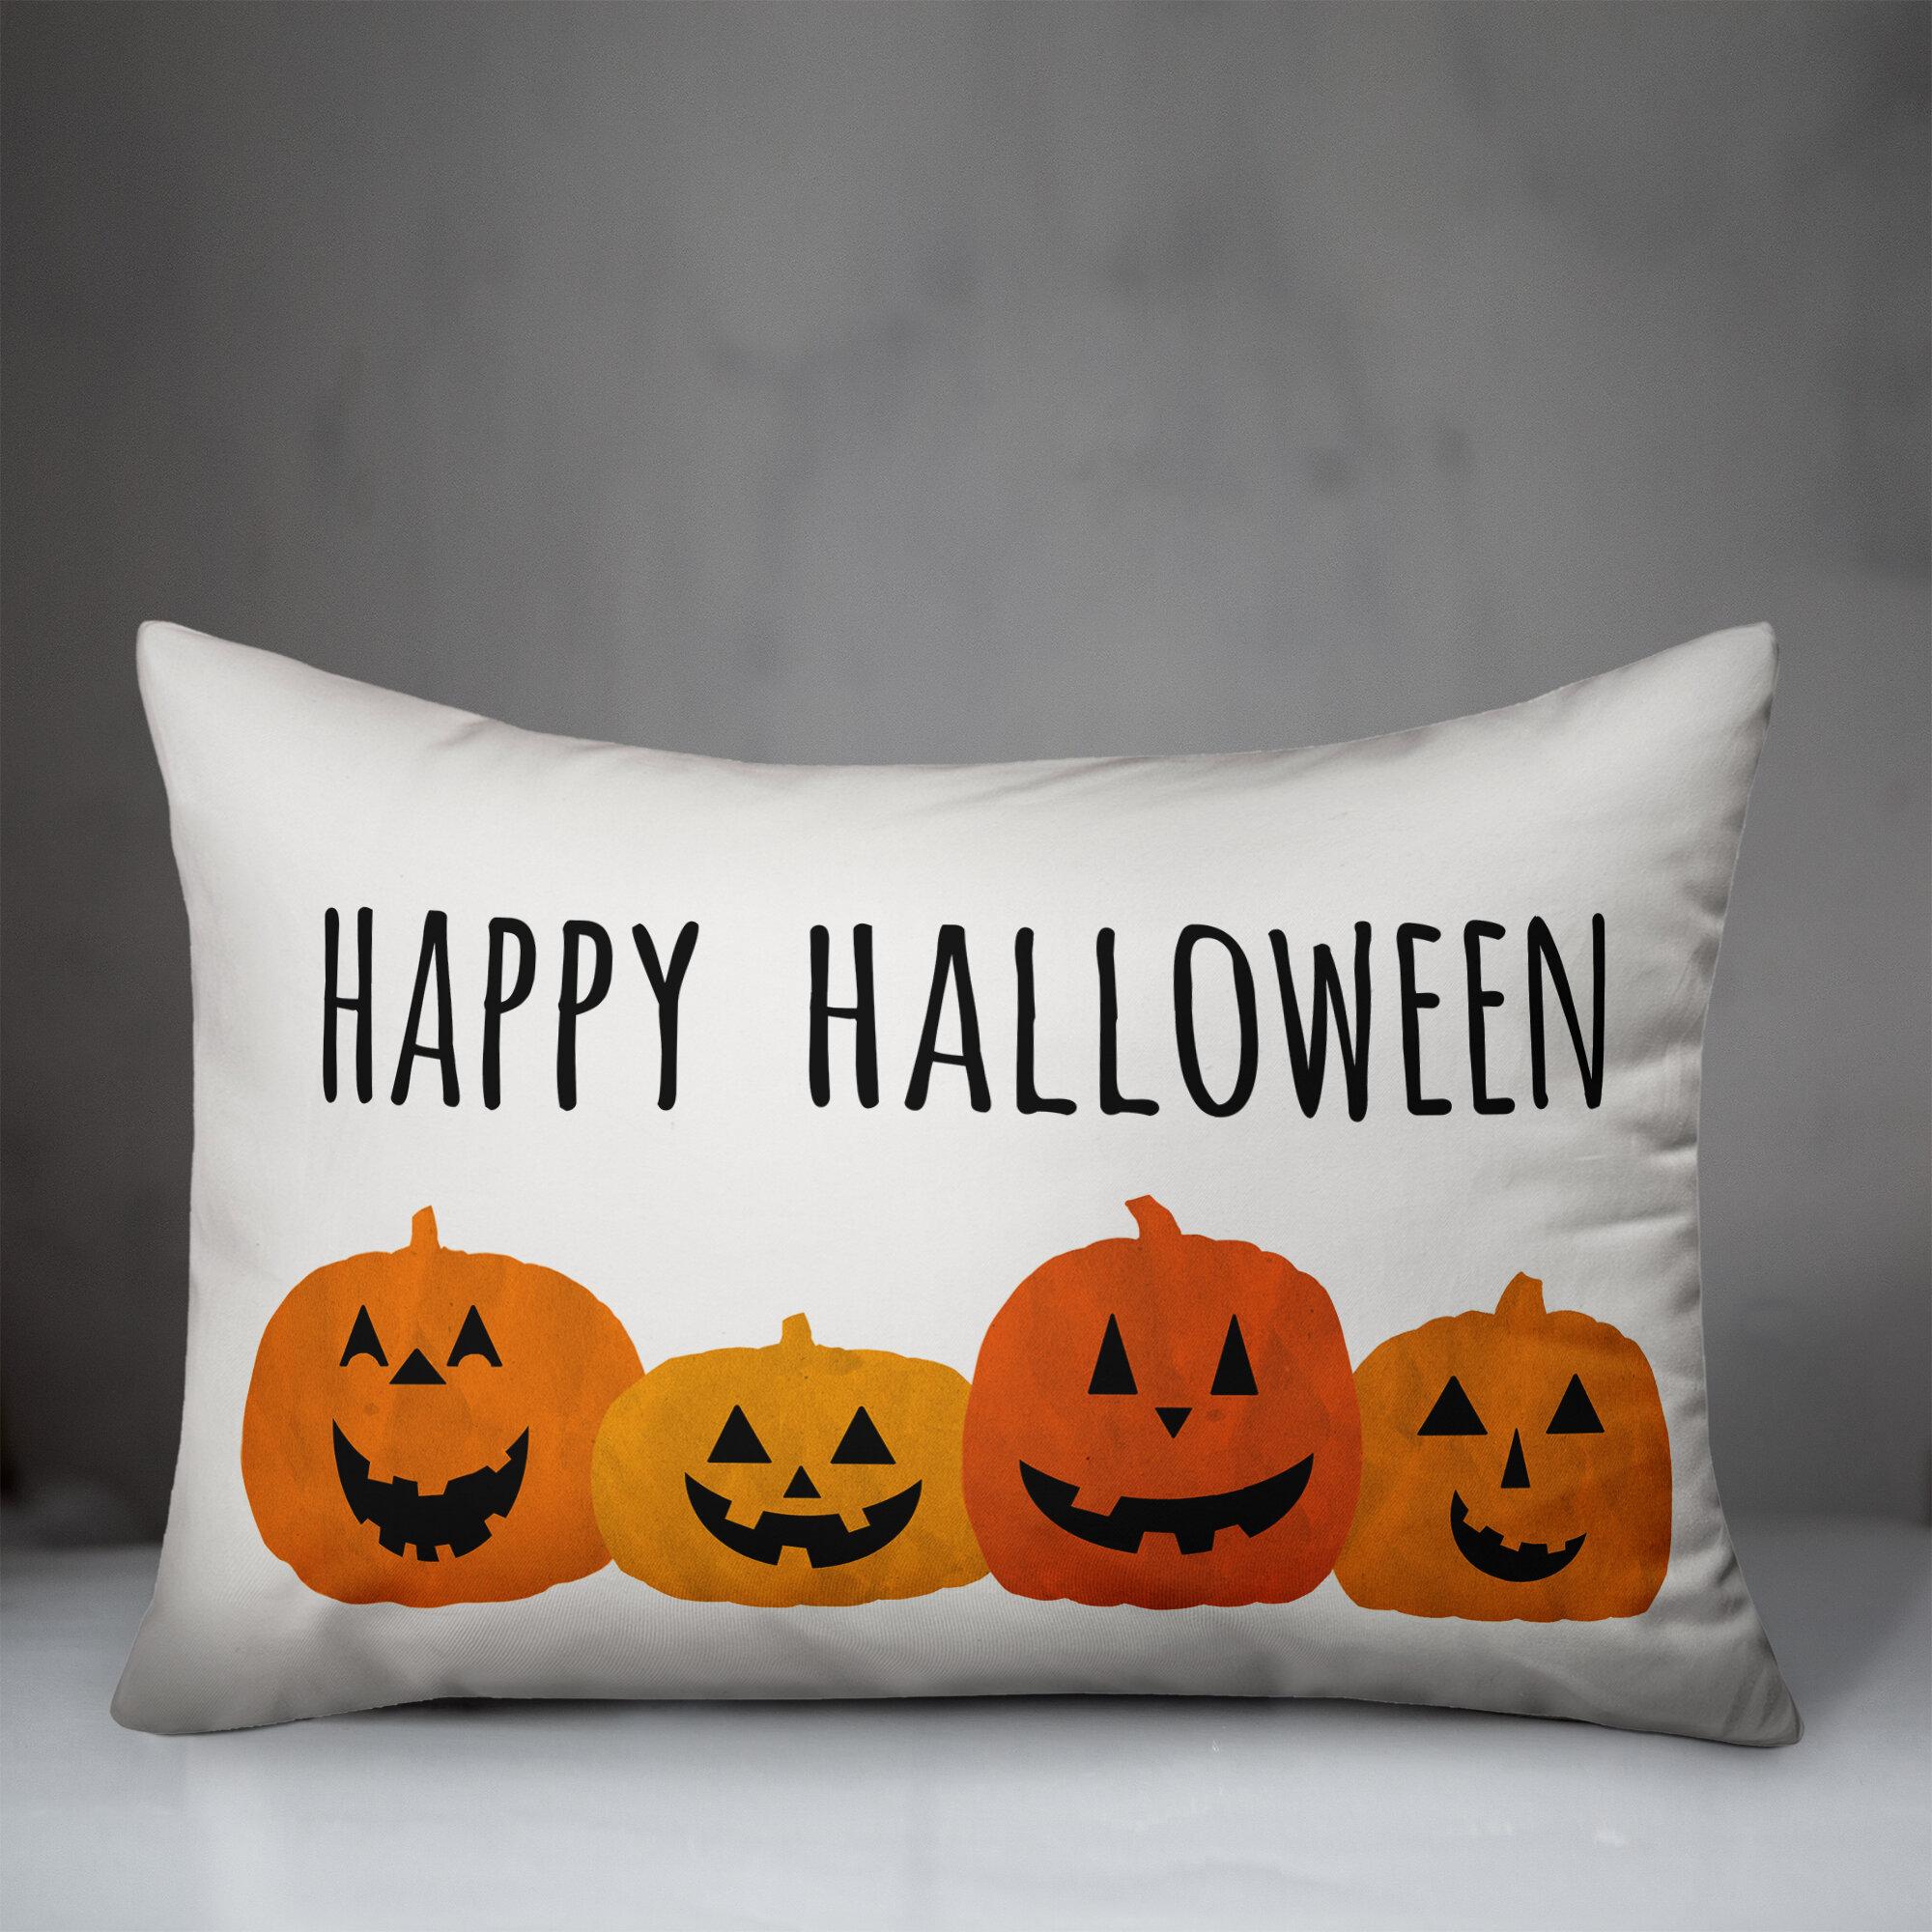 The Holiday Aisle Sowder Happy Halloween Pumpkins Lumbar Pillow